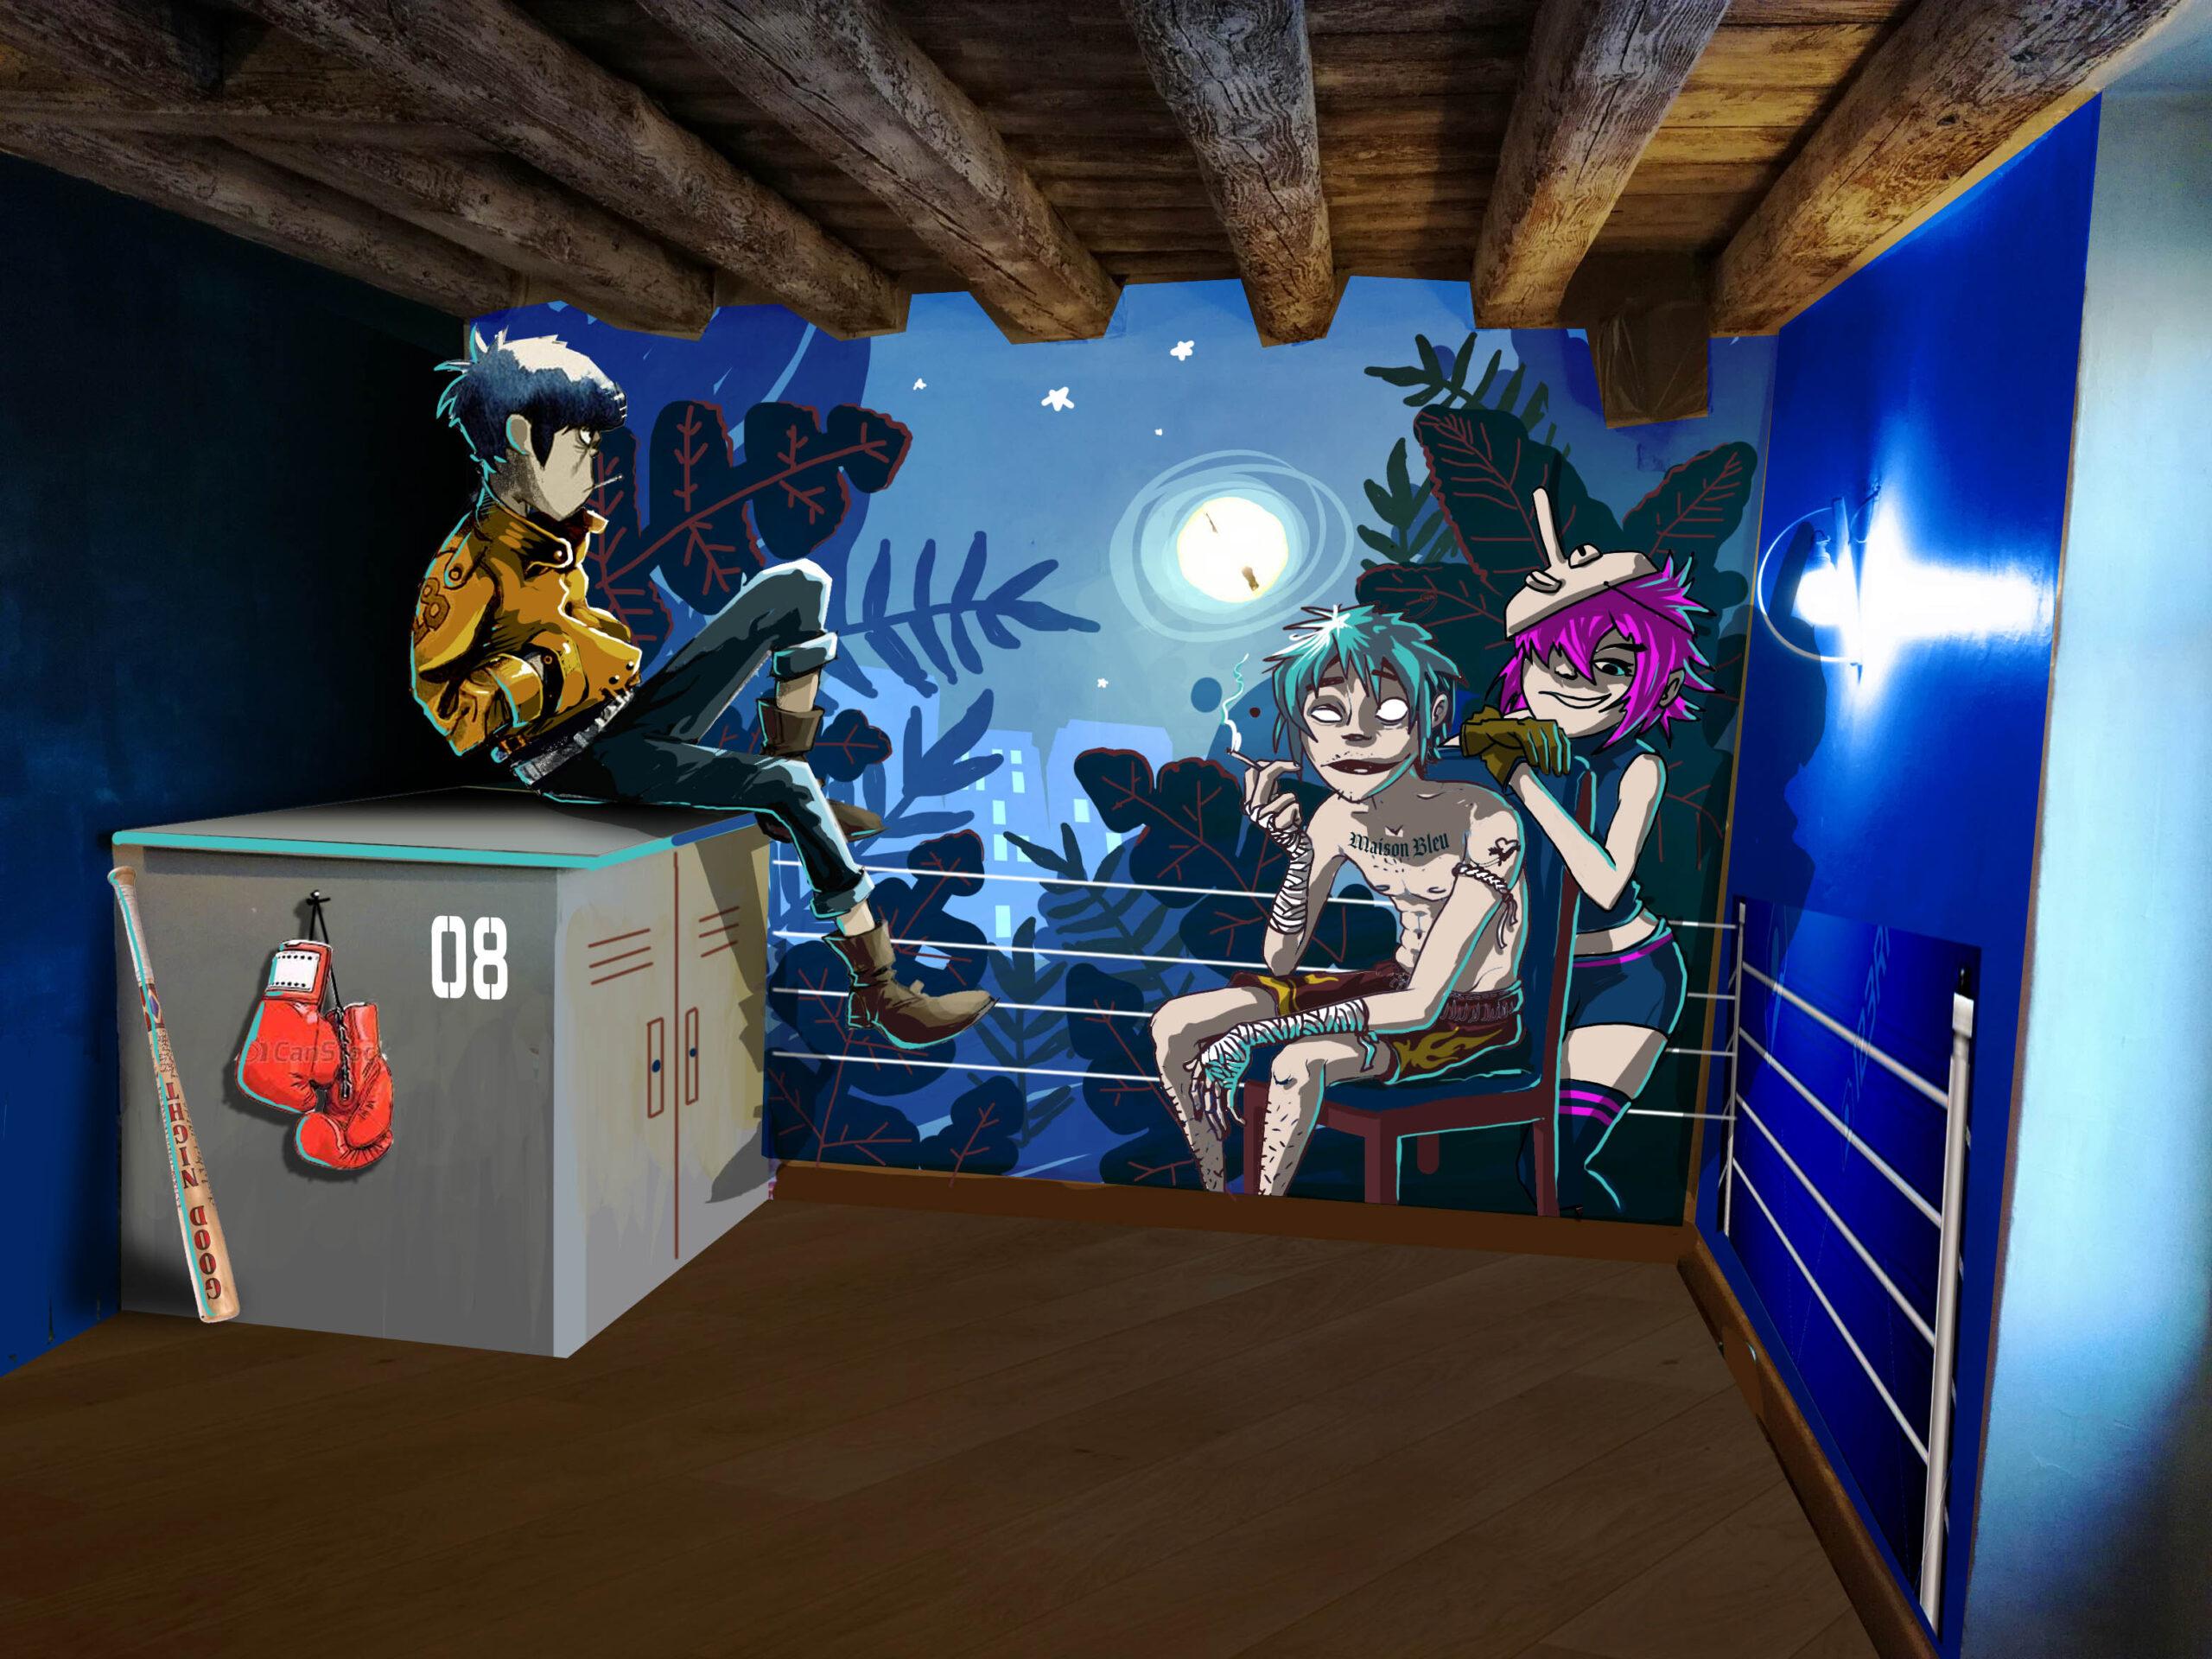 anamorphose lyon abys bar maison bleue décoration spray graffiti gorillaz peinture murale illustration spary urbanart street art maquette